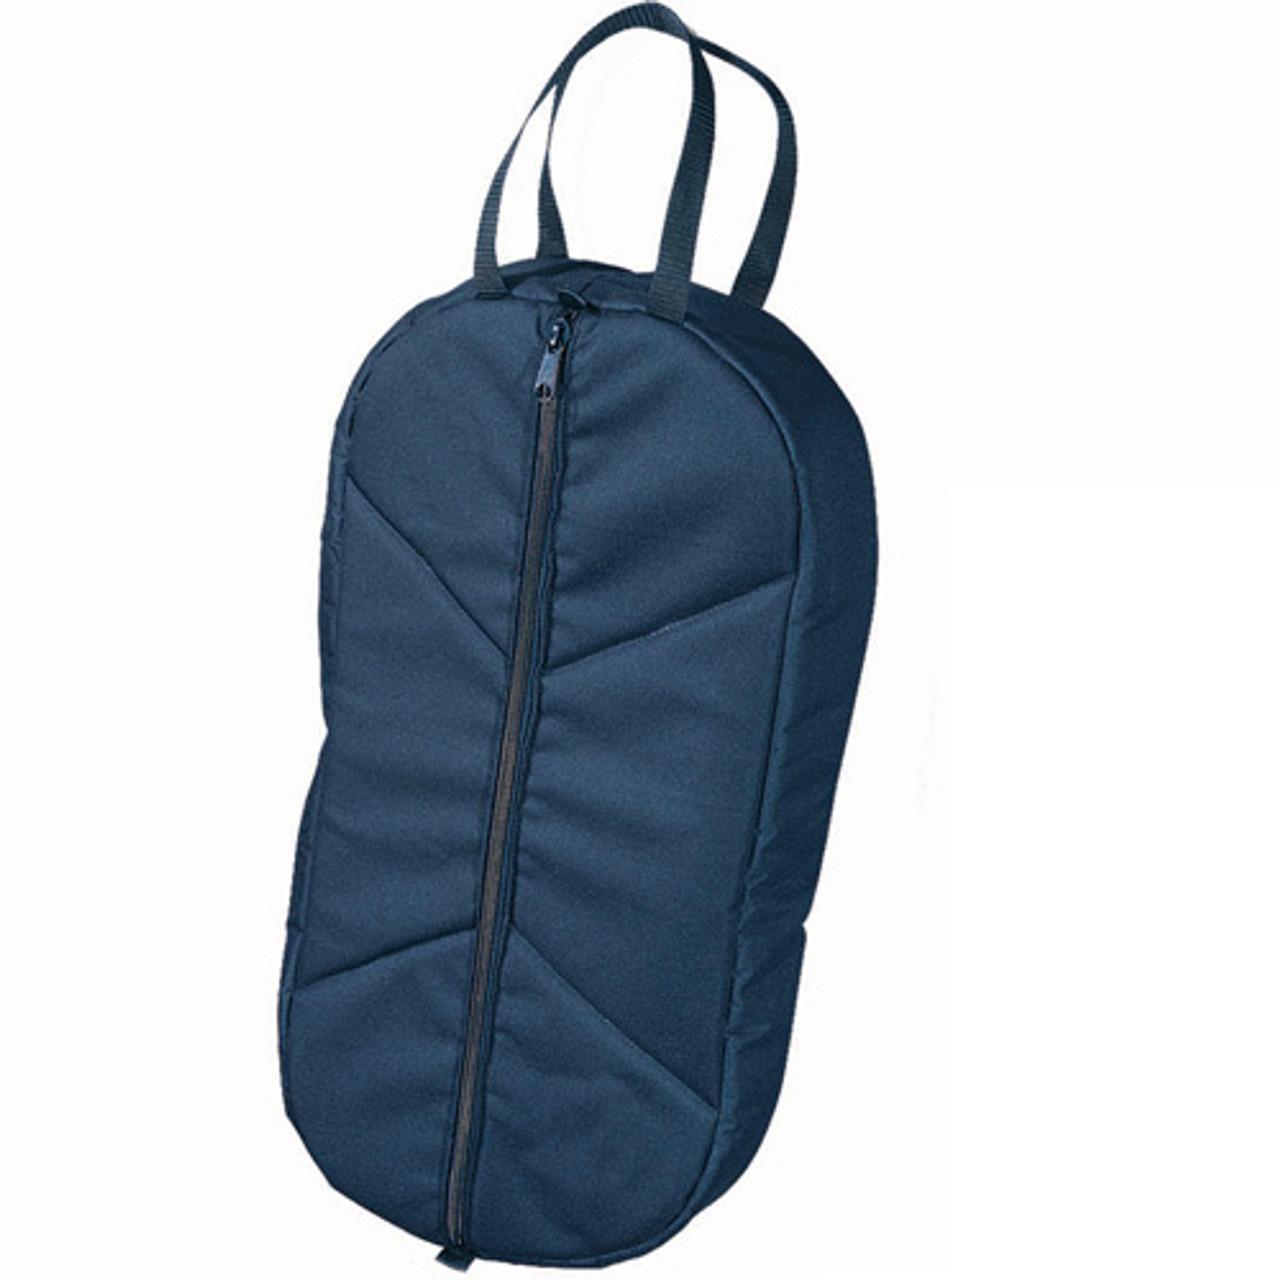 Halter Bridle Bag 30 X 15 Horse Tack Gear Bags